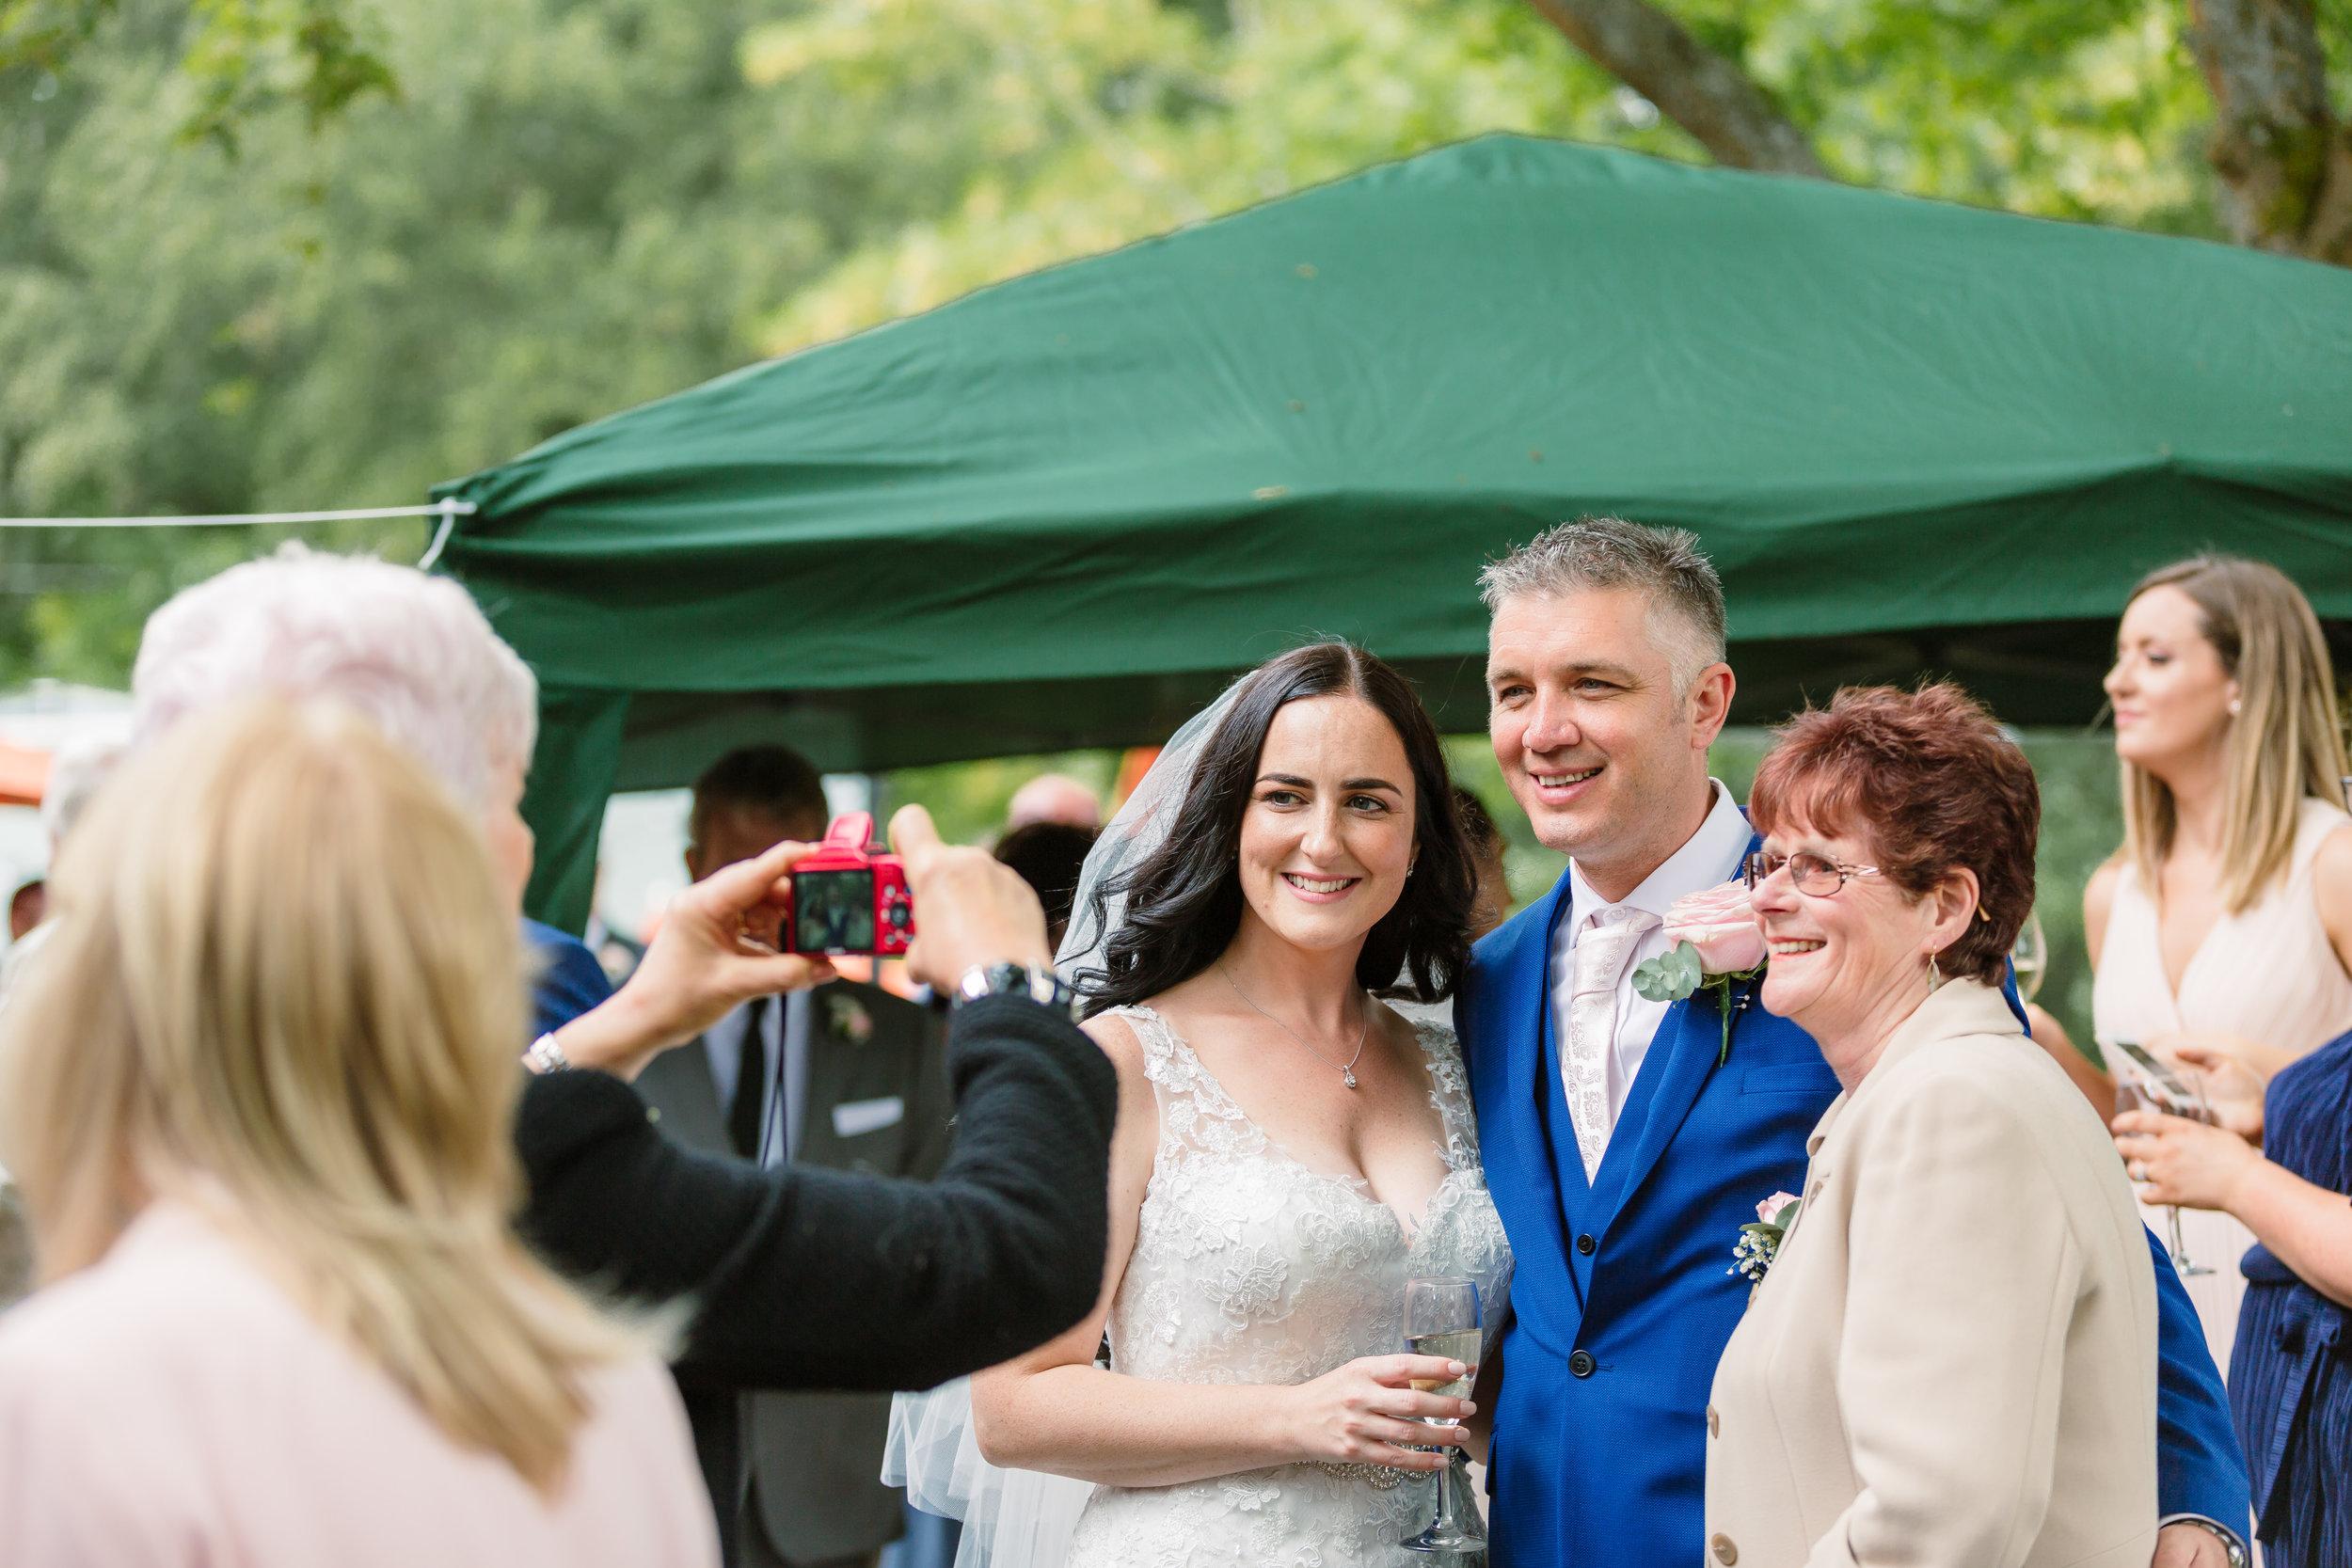 Sarah-Fishlock-Photography : Hampshire-wedding-photographer-hampshire : fleet-wedding-photographer-fleet : Meade-Hall-Wedding-Photographer : Meade-Hall-Wedding-Photos-619.jpg